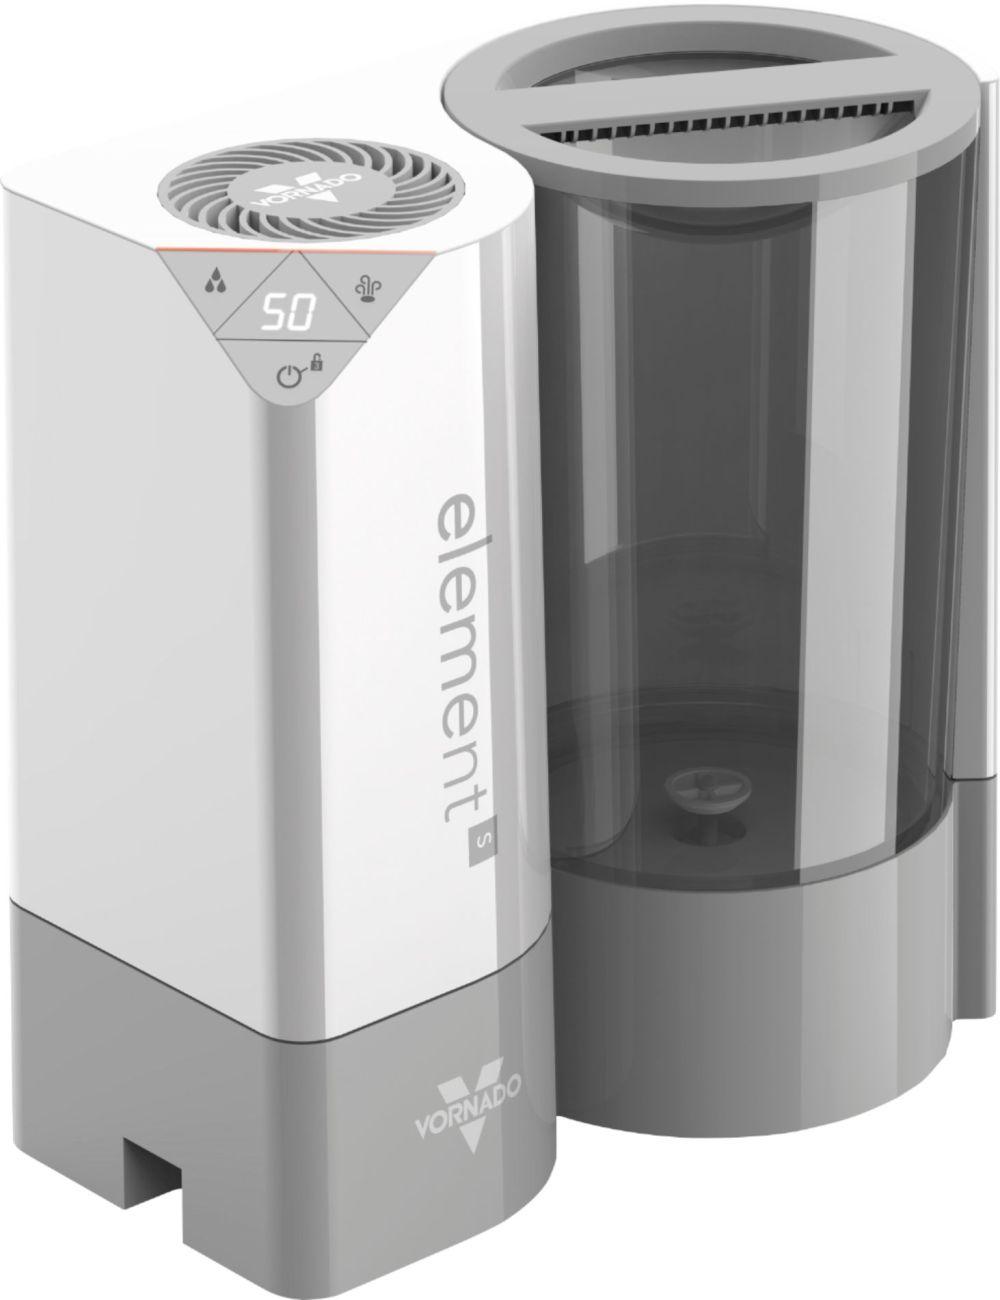 medium resolution of vaporizer humidifier ice white element s best buy